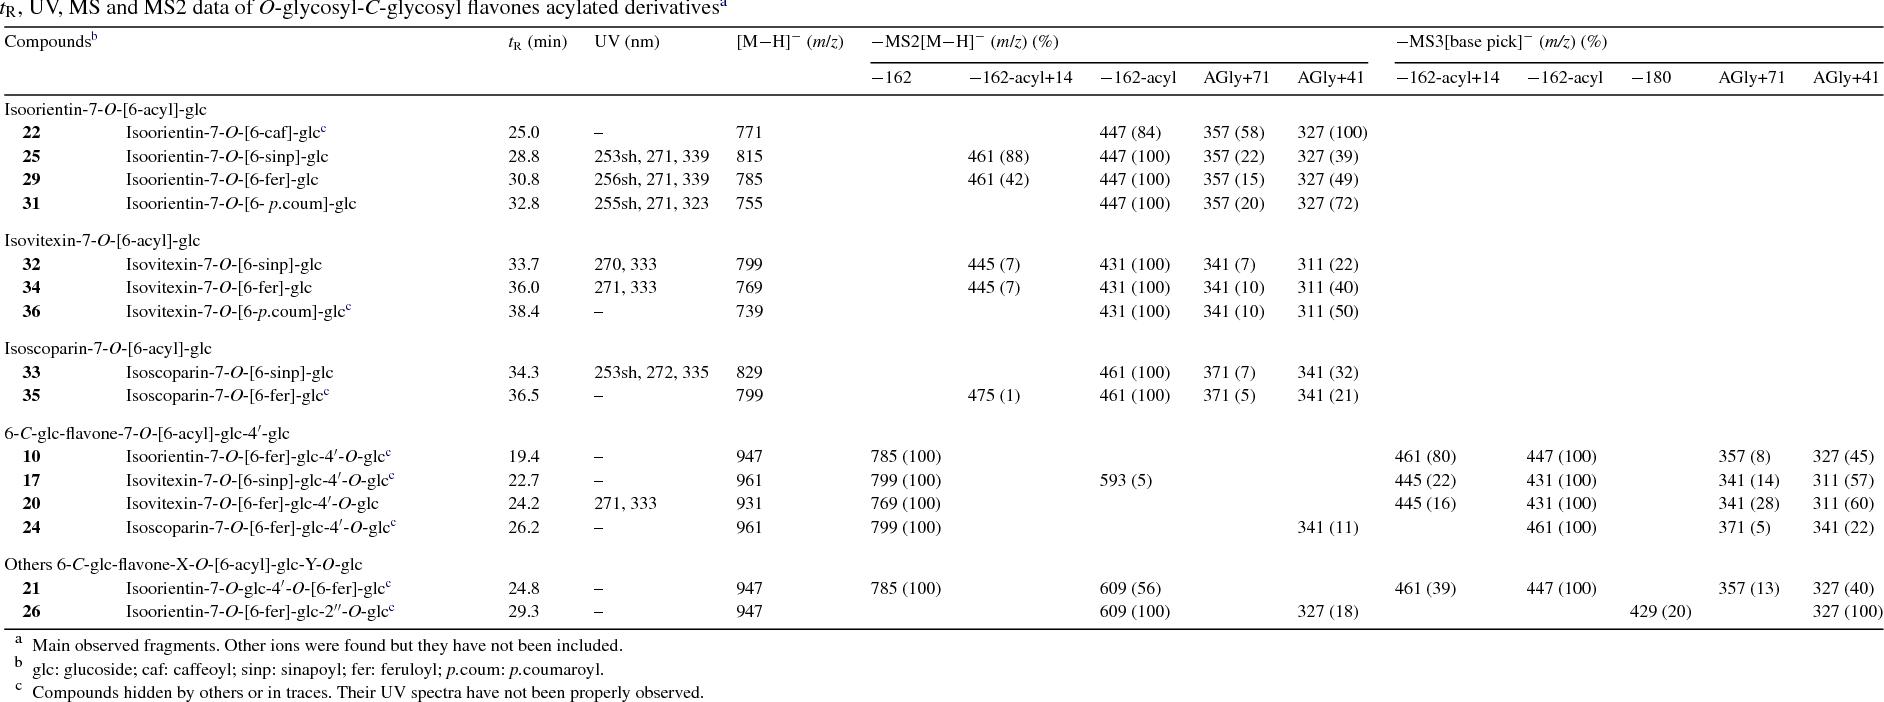 Table 5 tR, UV, MS and MS2 data of O-glycosyl-C-glycosyl flavones acylated derivativesa